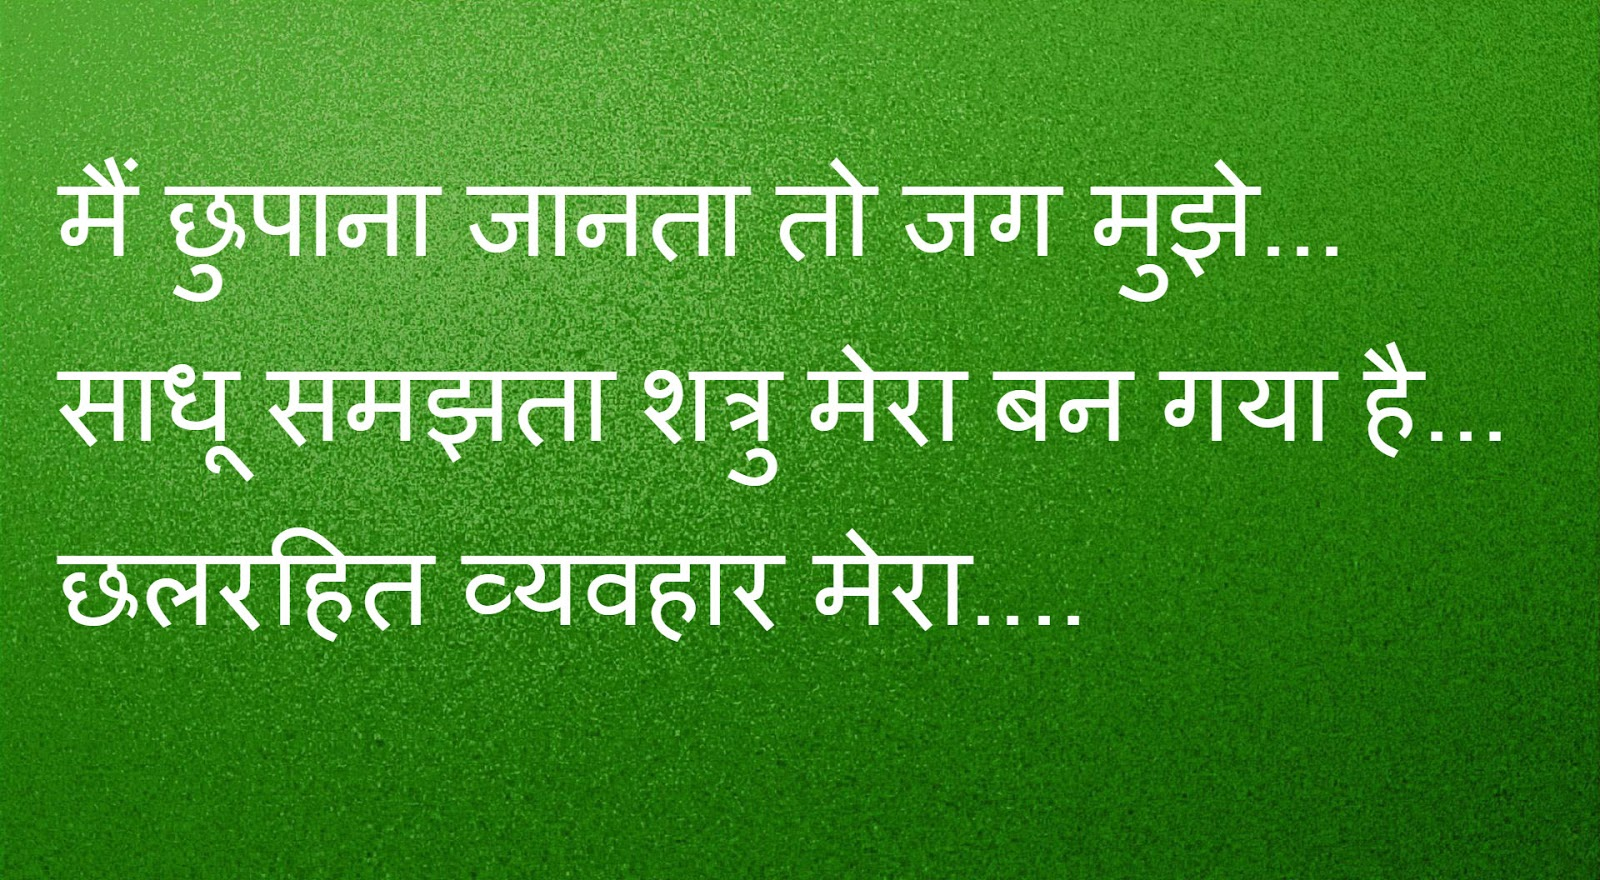 Good Line Image In Hindi Djiwallpaperco